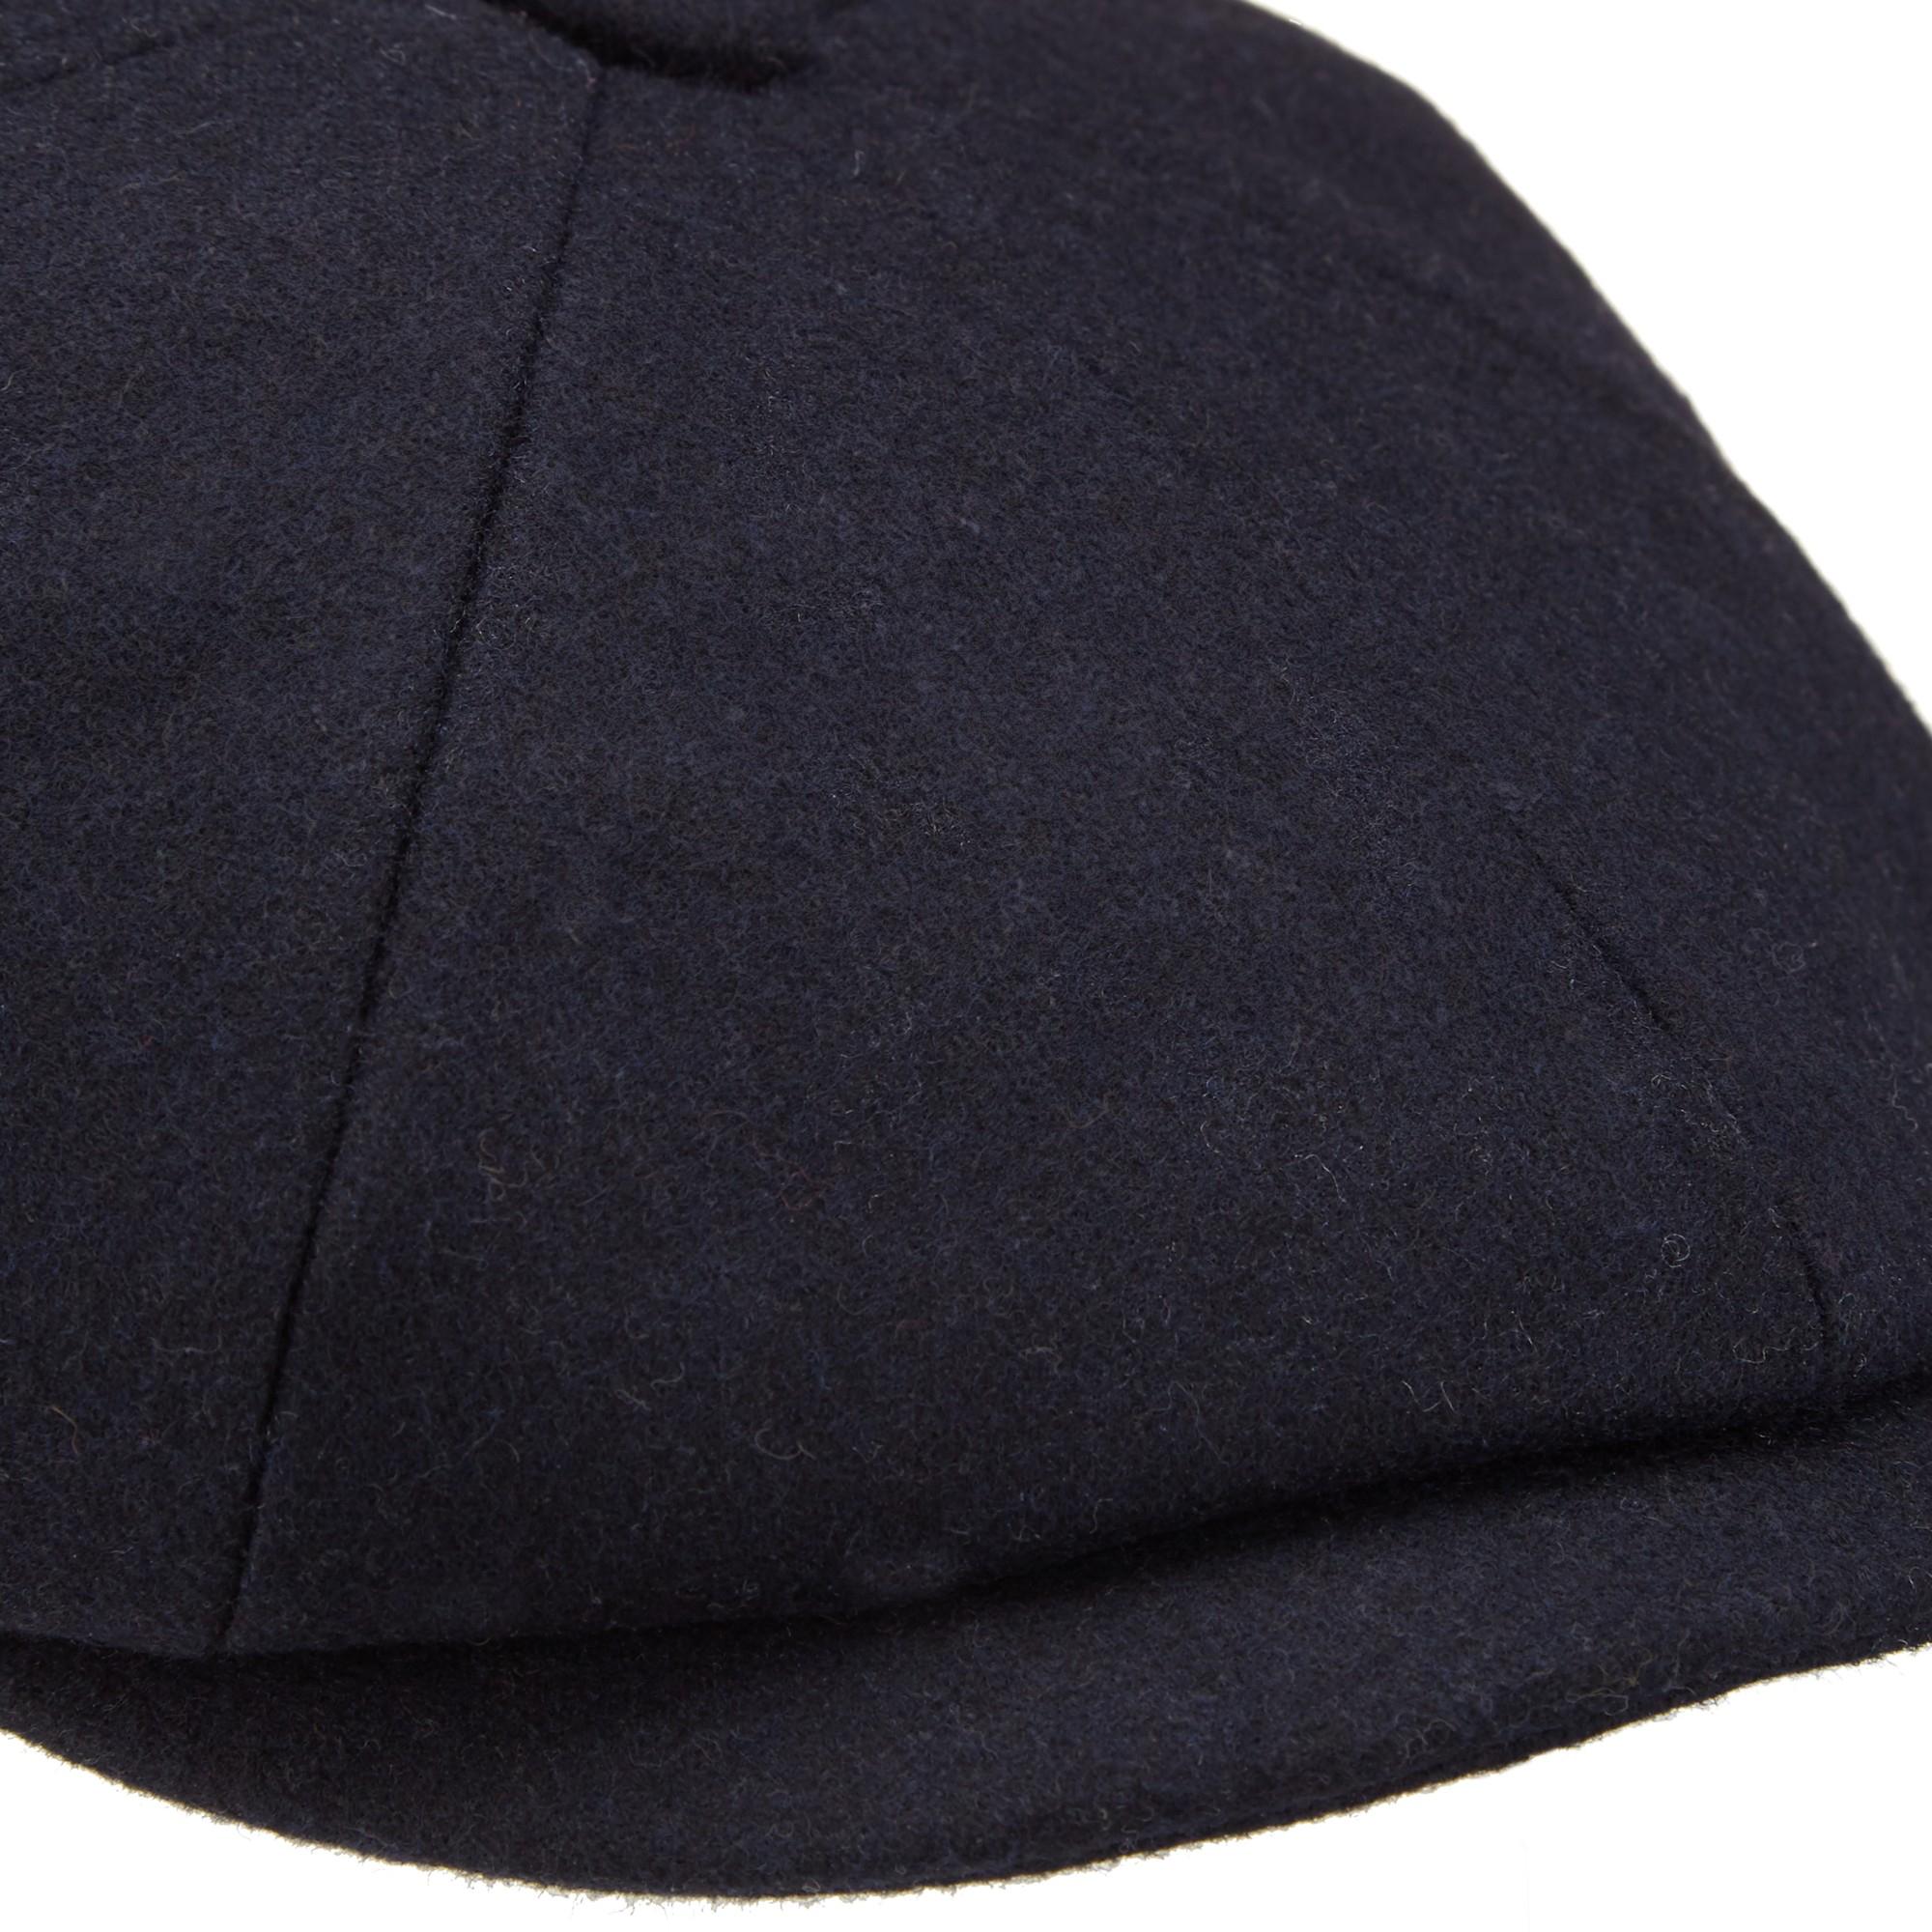 b992b9e9b70 John Lewis Melton Baker Boy Hat in Blue for Men - Lyst